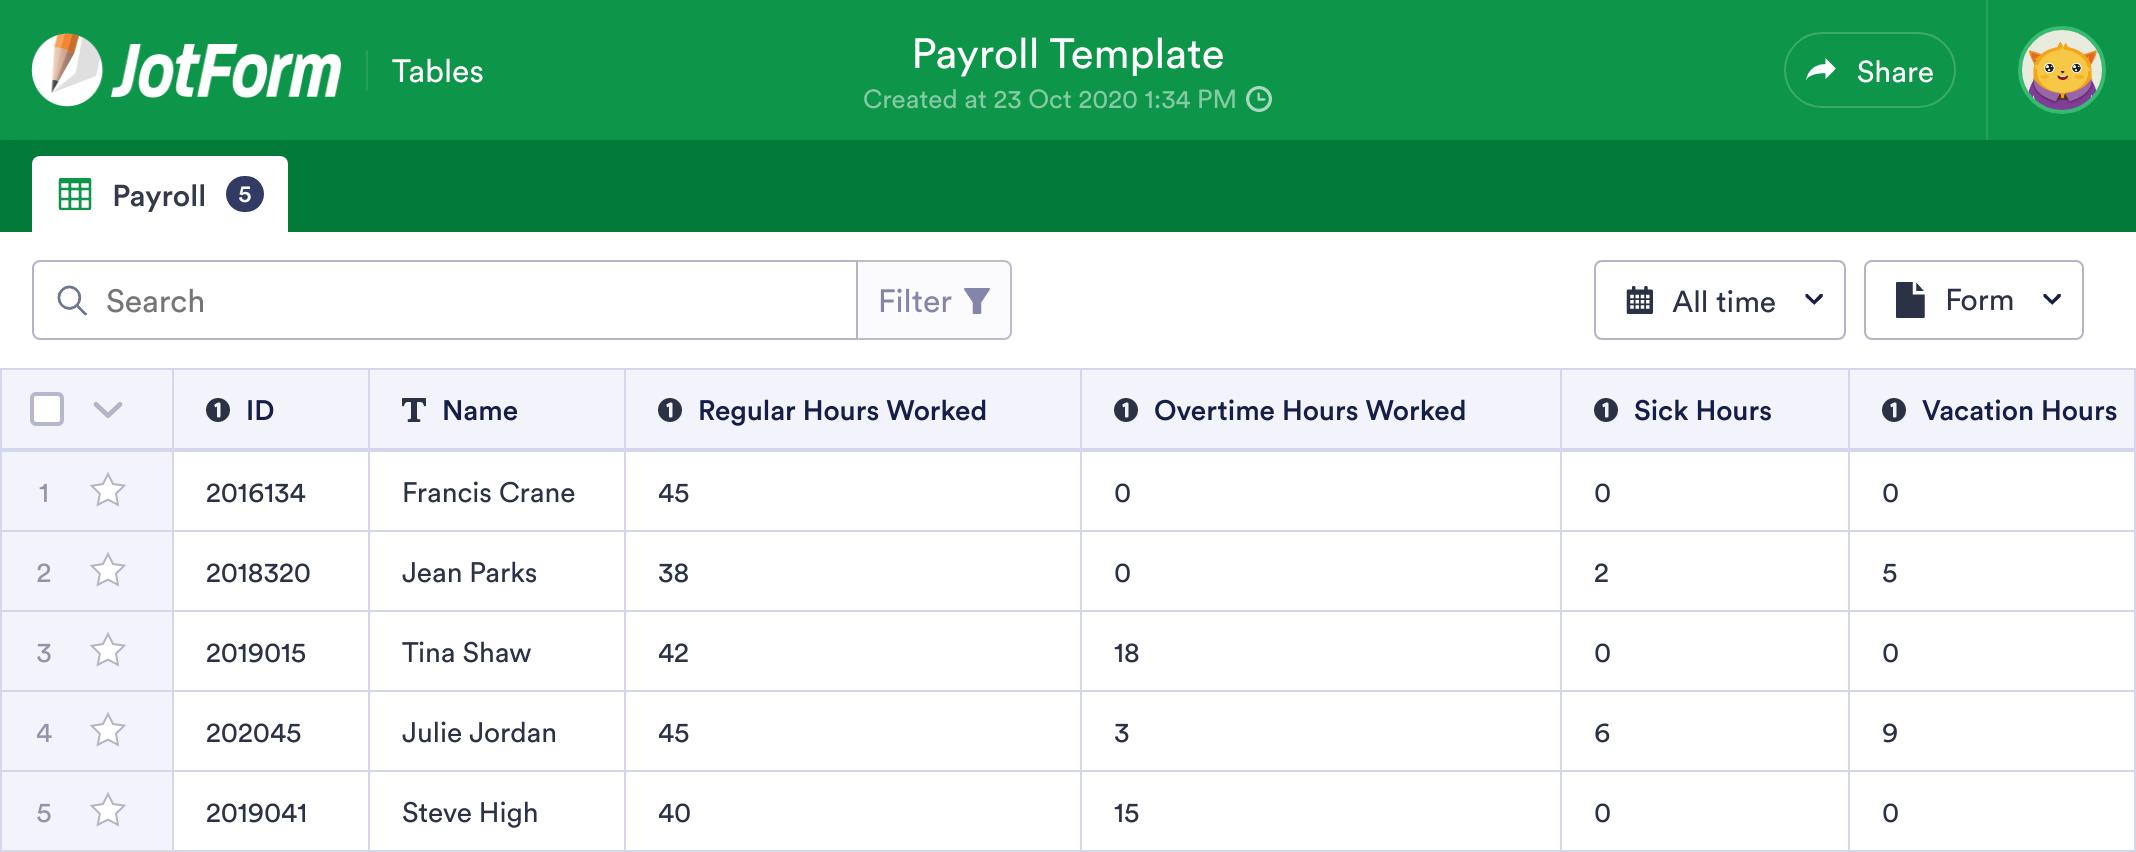 Payroll Template